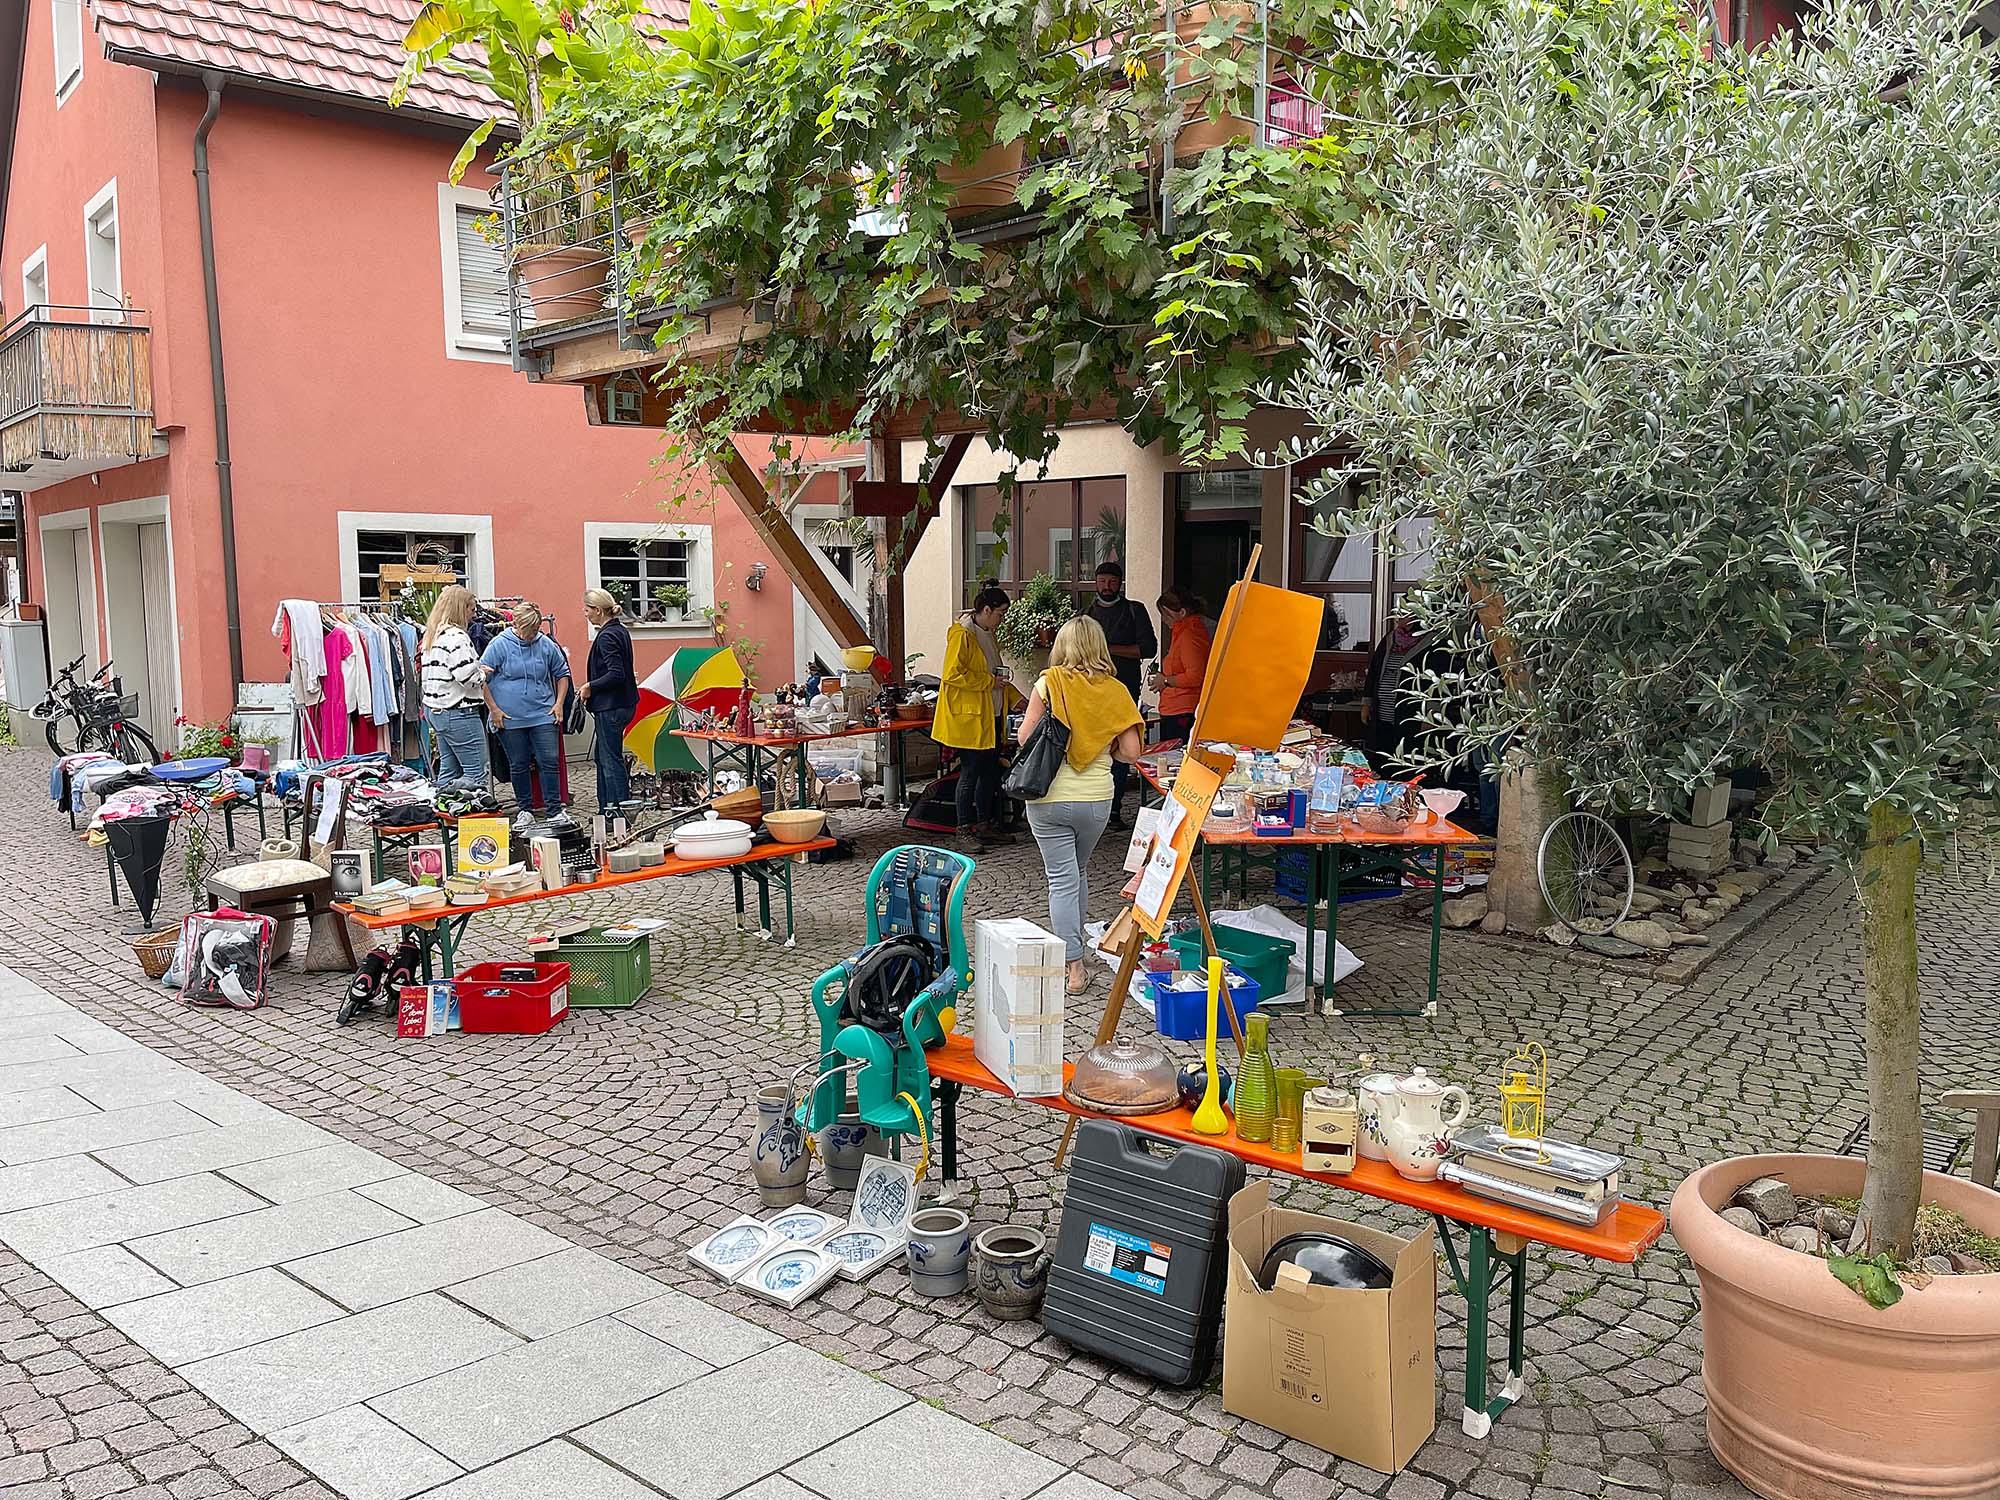 2021-9-1-HA-Messmer-Flohmarkt-Aktion- Hochwasser-FlutopferImage-3